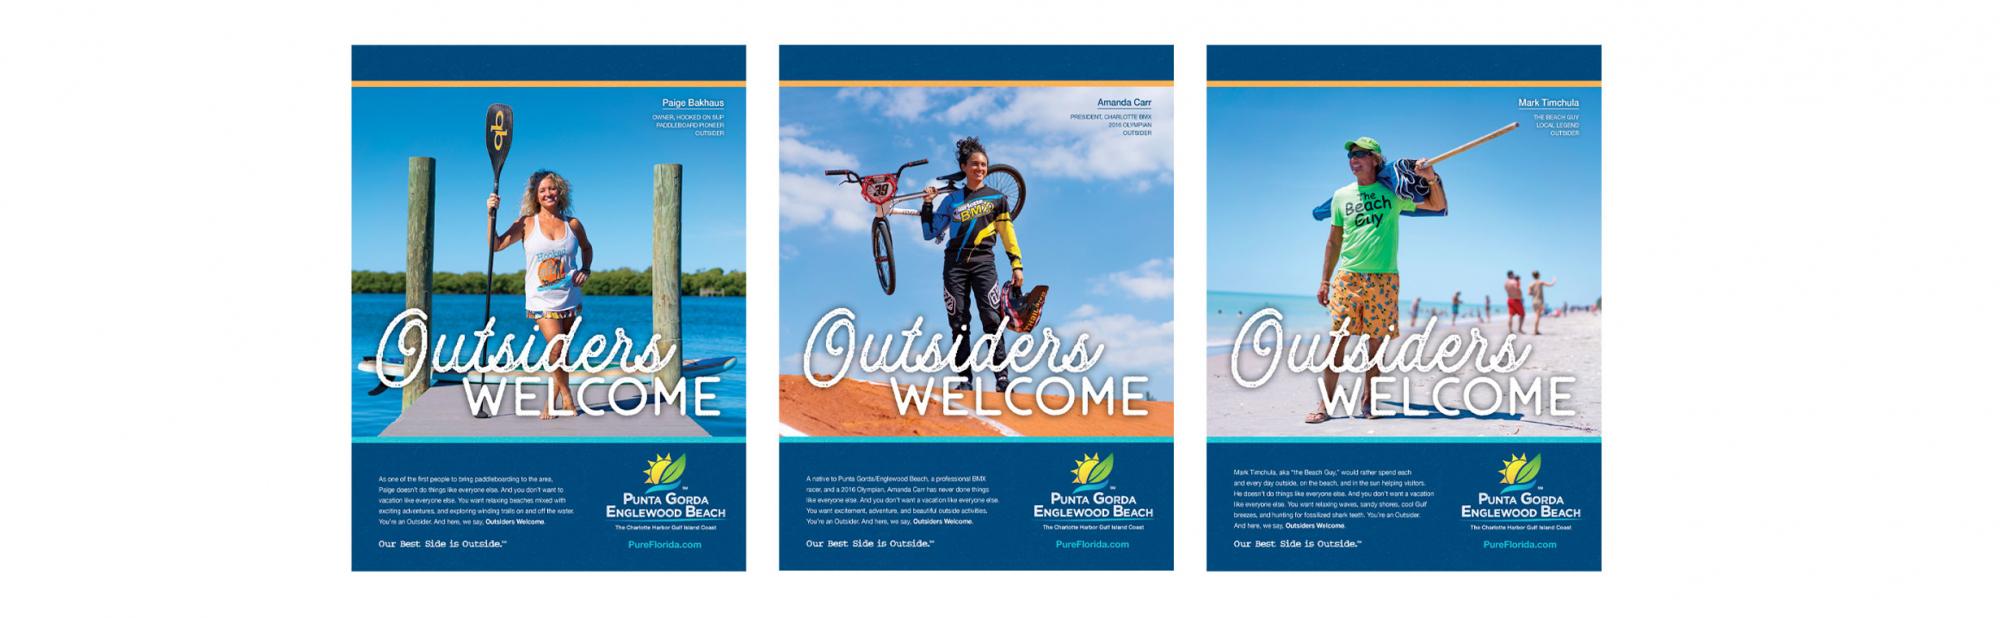 Outsiders print ads